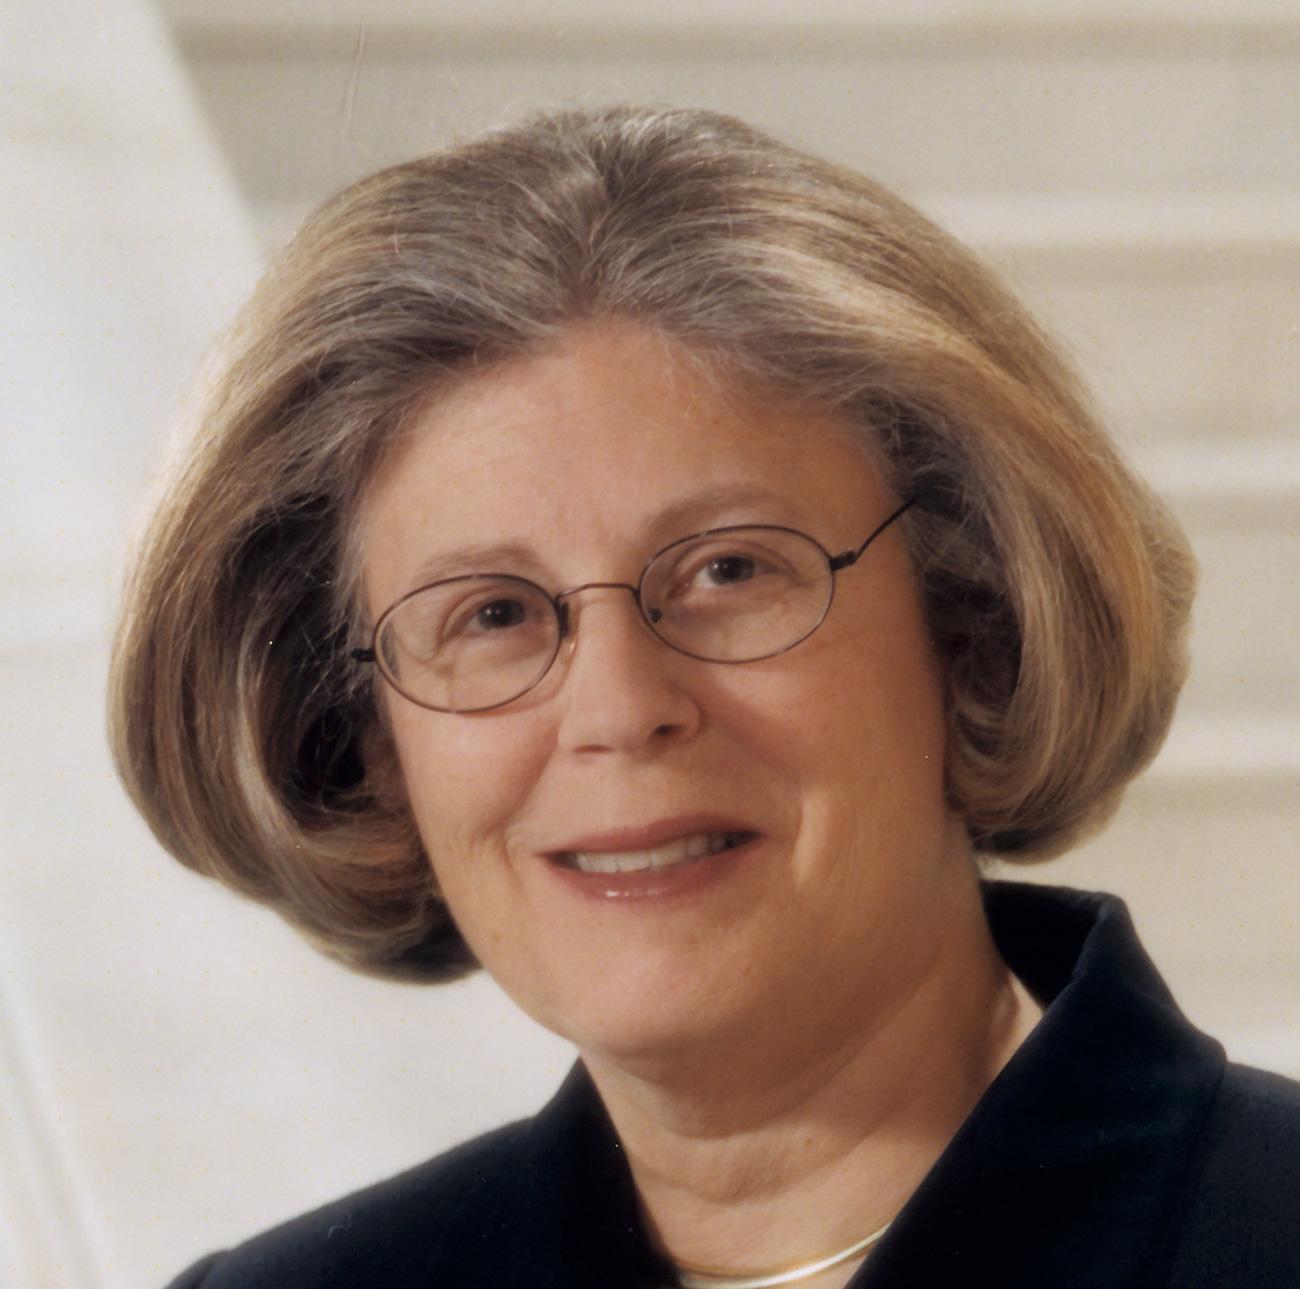 Zoe Hall